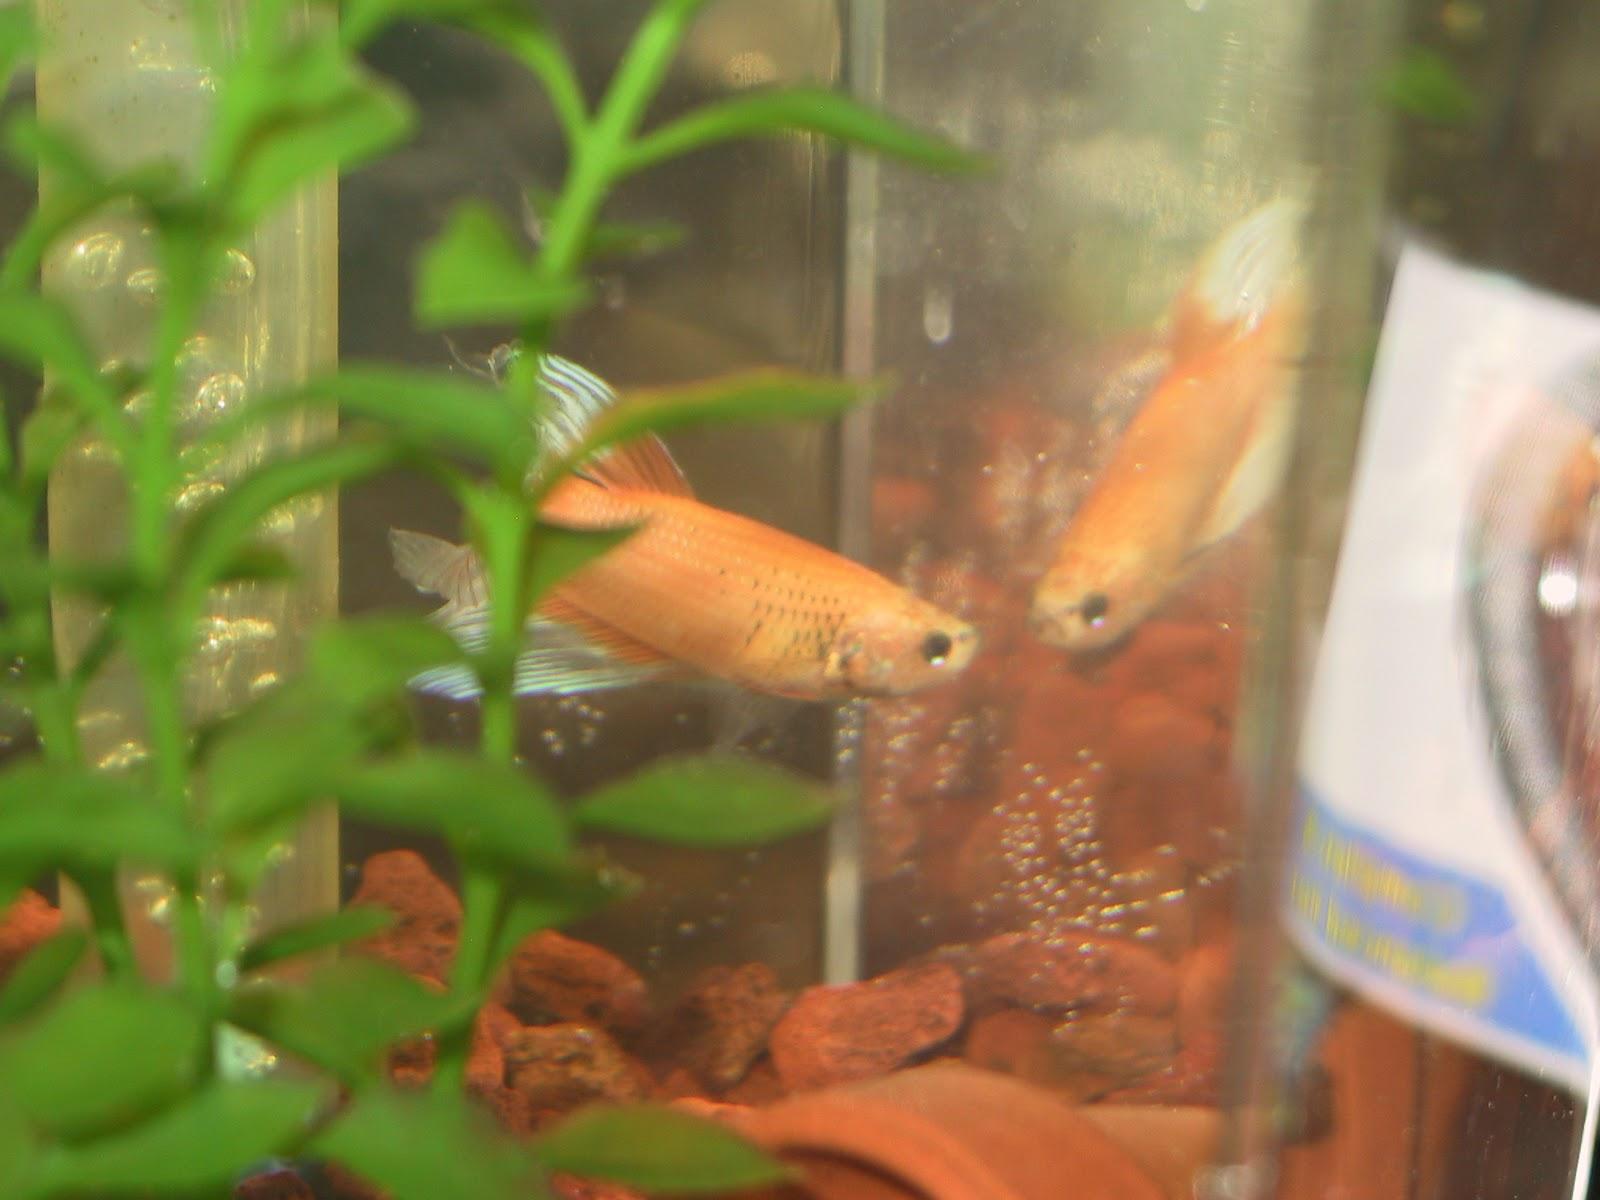 Loneguppy 39 s showcase the new betta for Betta fish water change